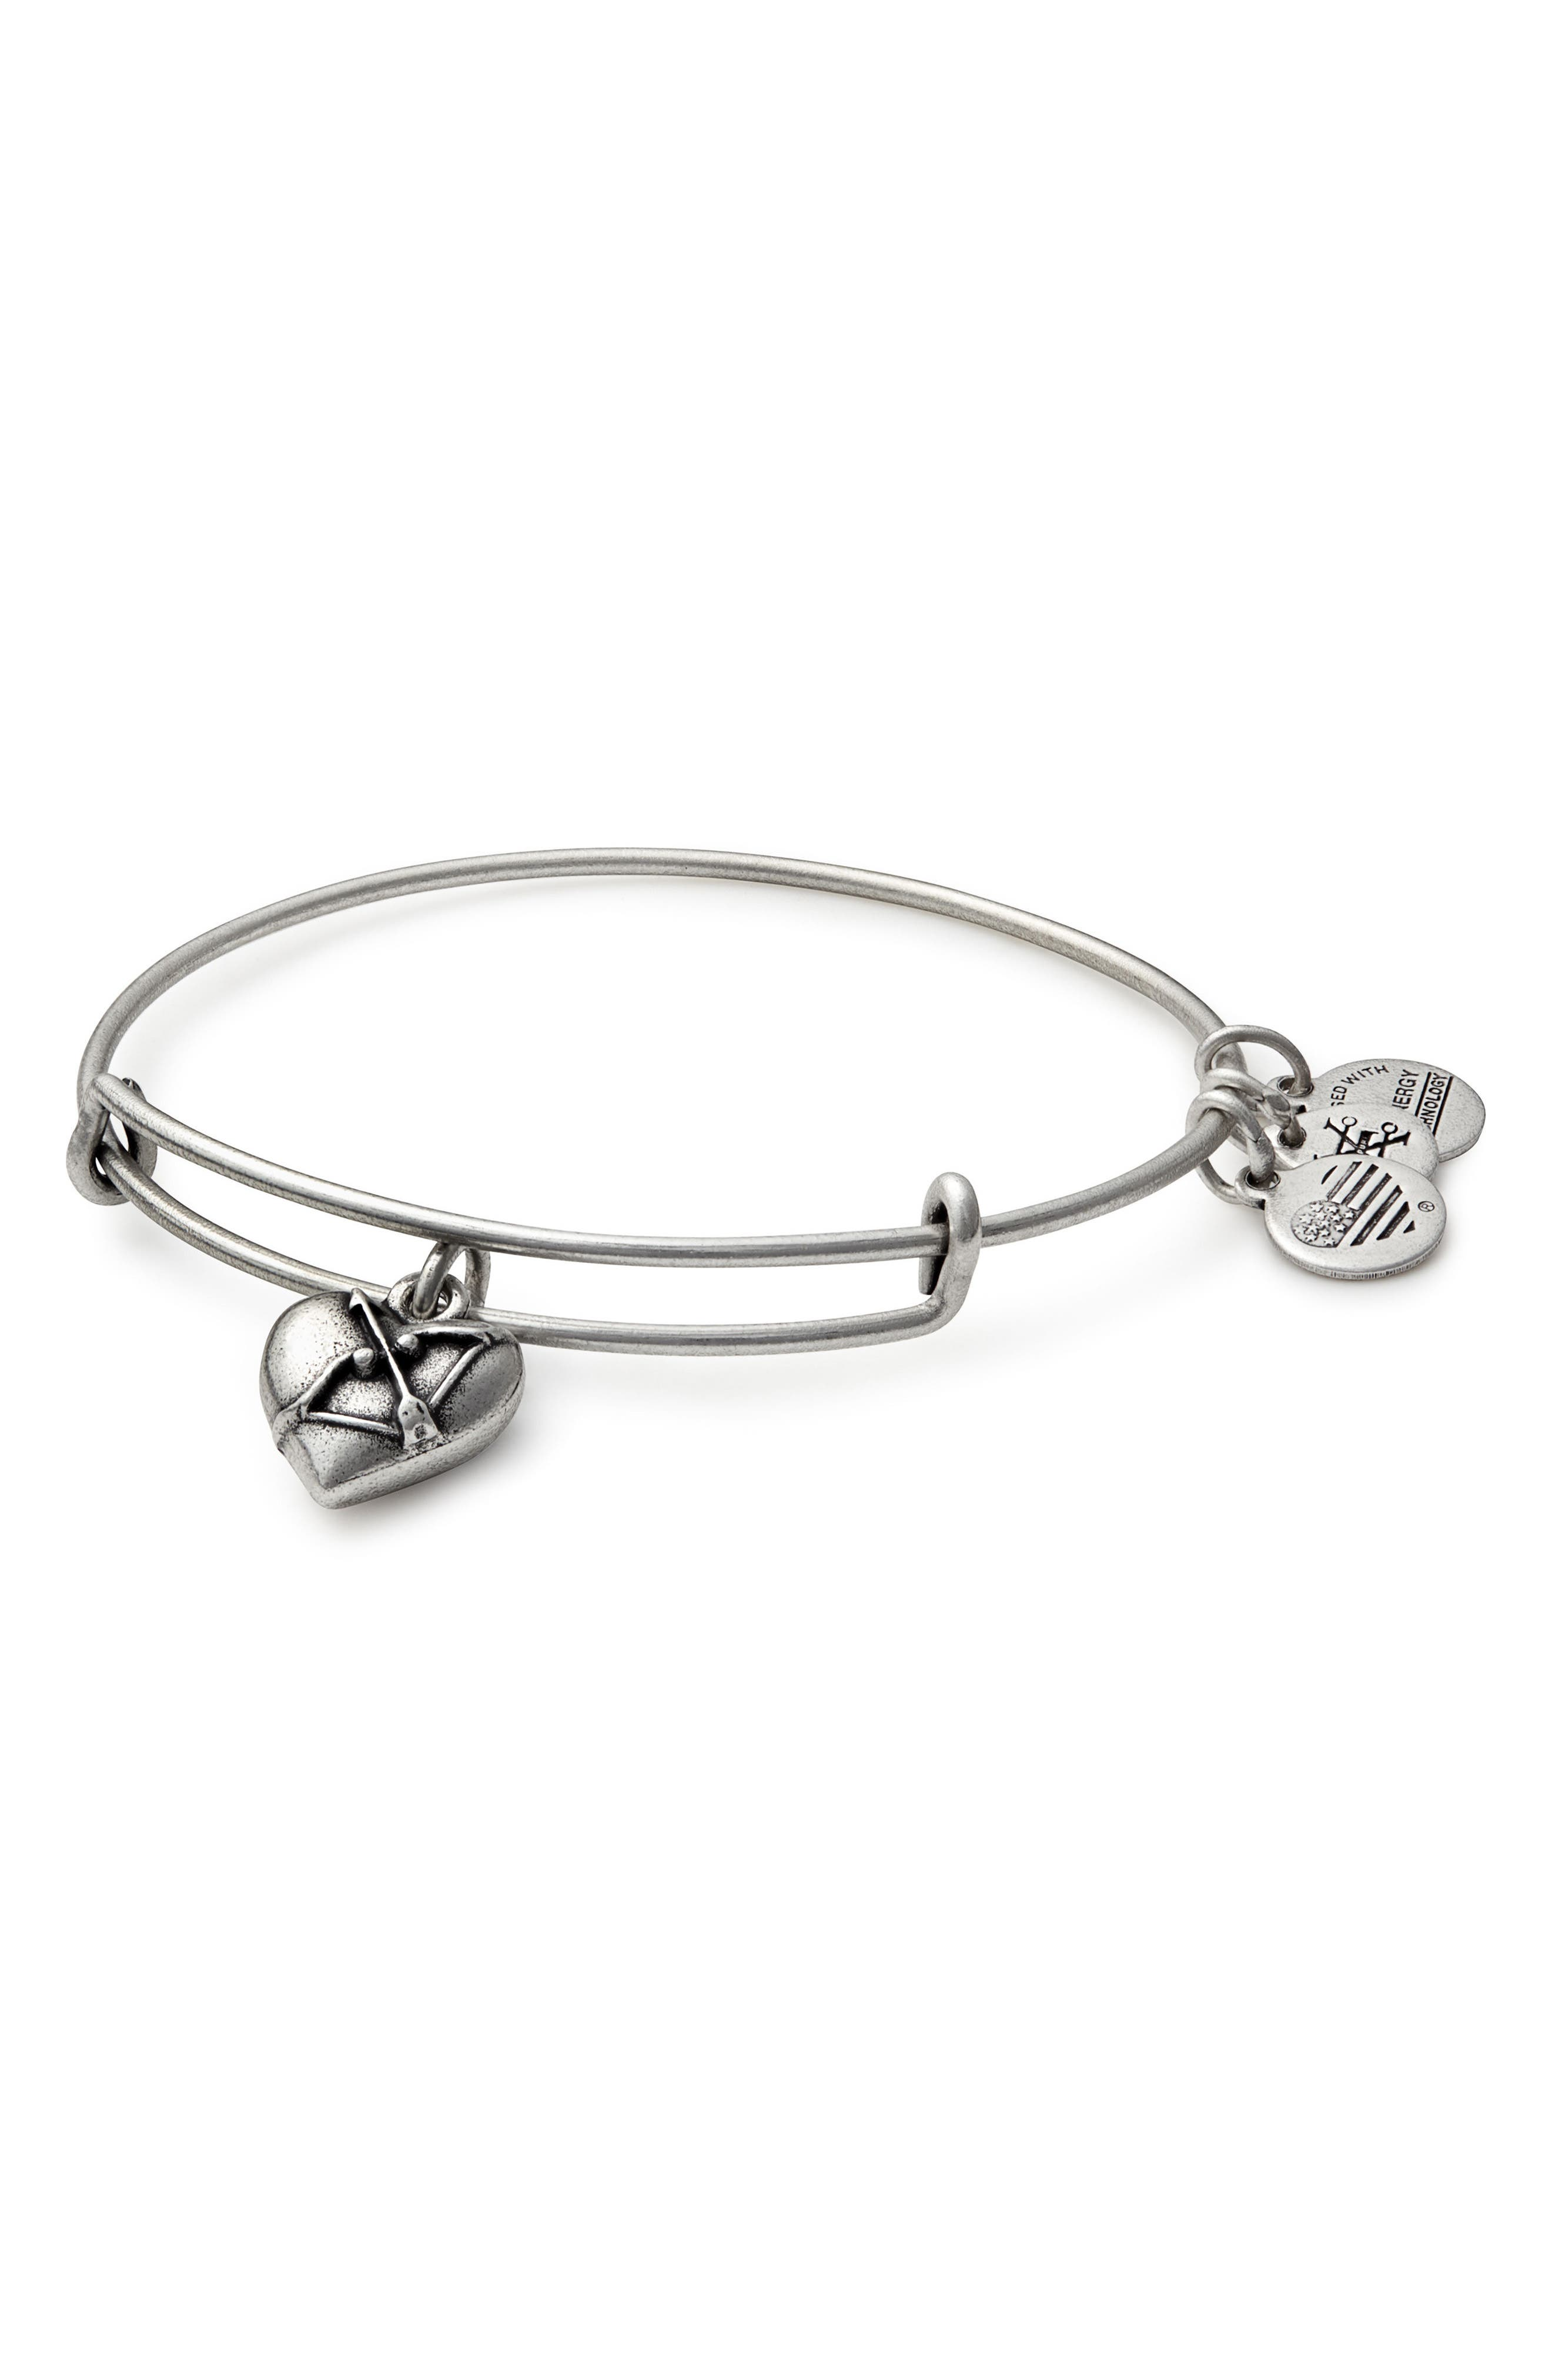 Main Image - Alex and Ani Cupid's Heart Expandable Charm Bracelet